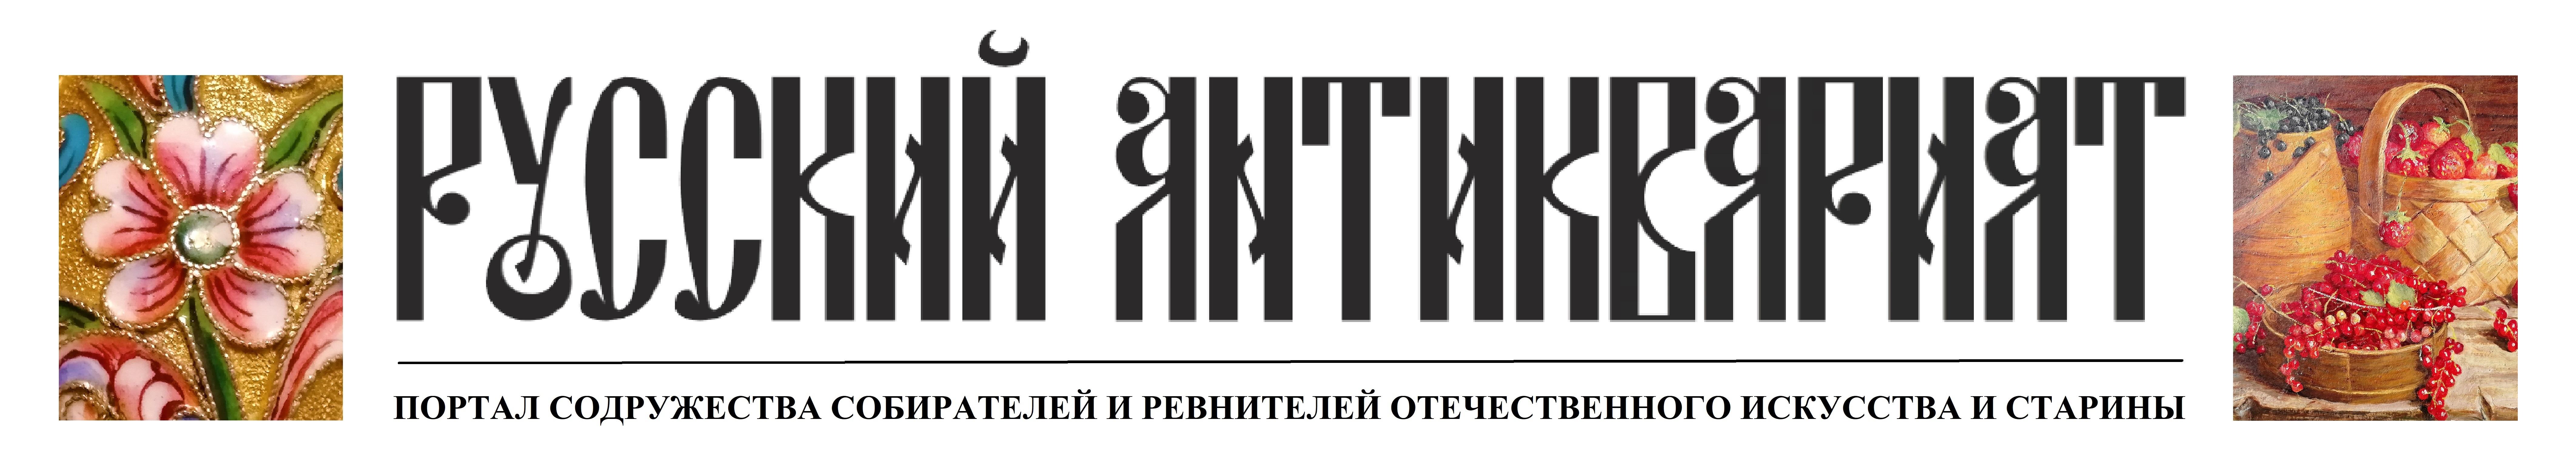 РУССКИЙ АНТИКВАРИАТ